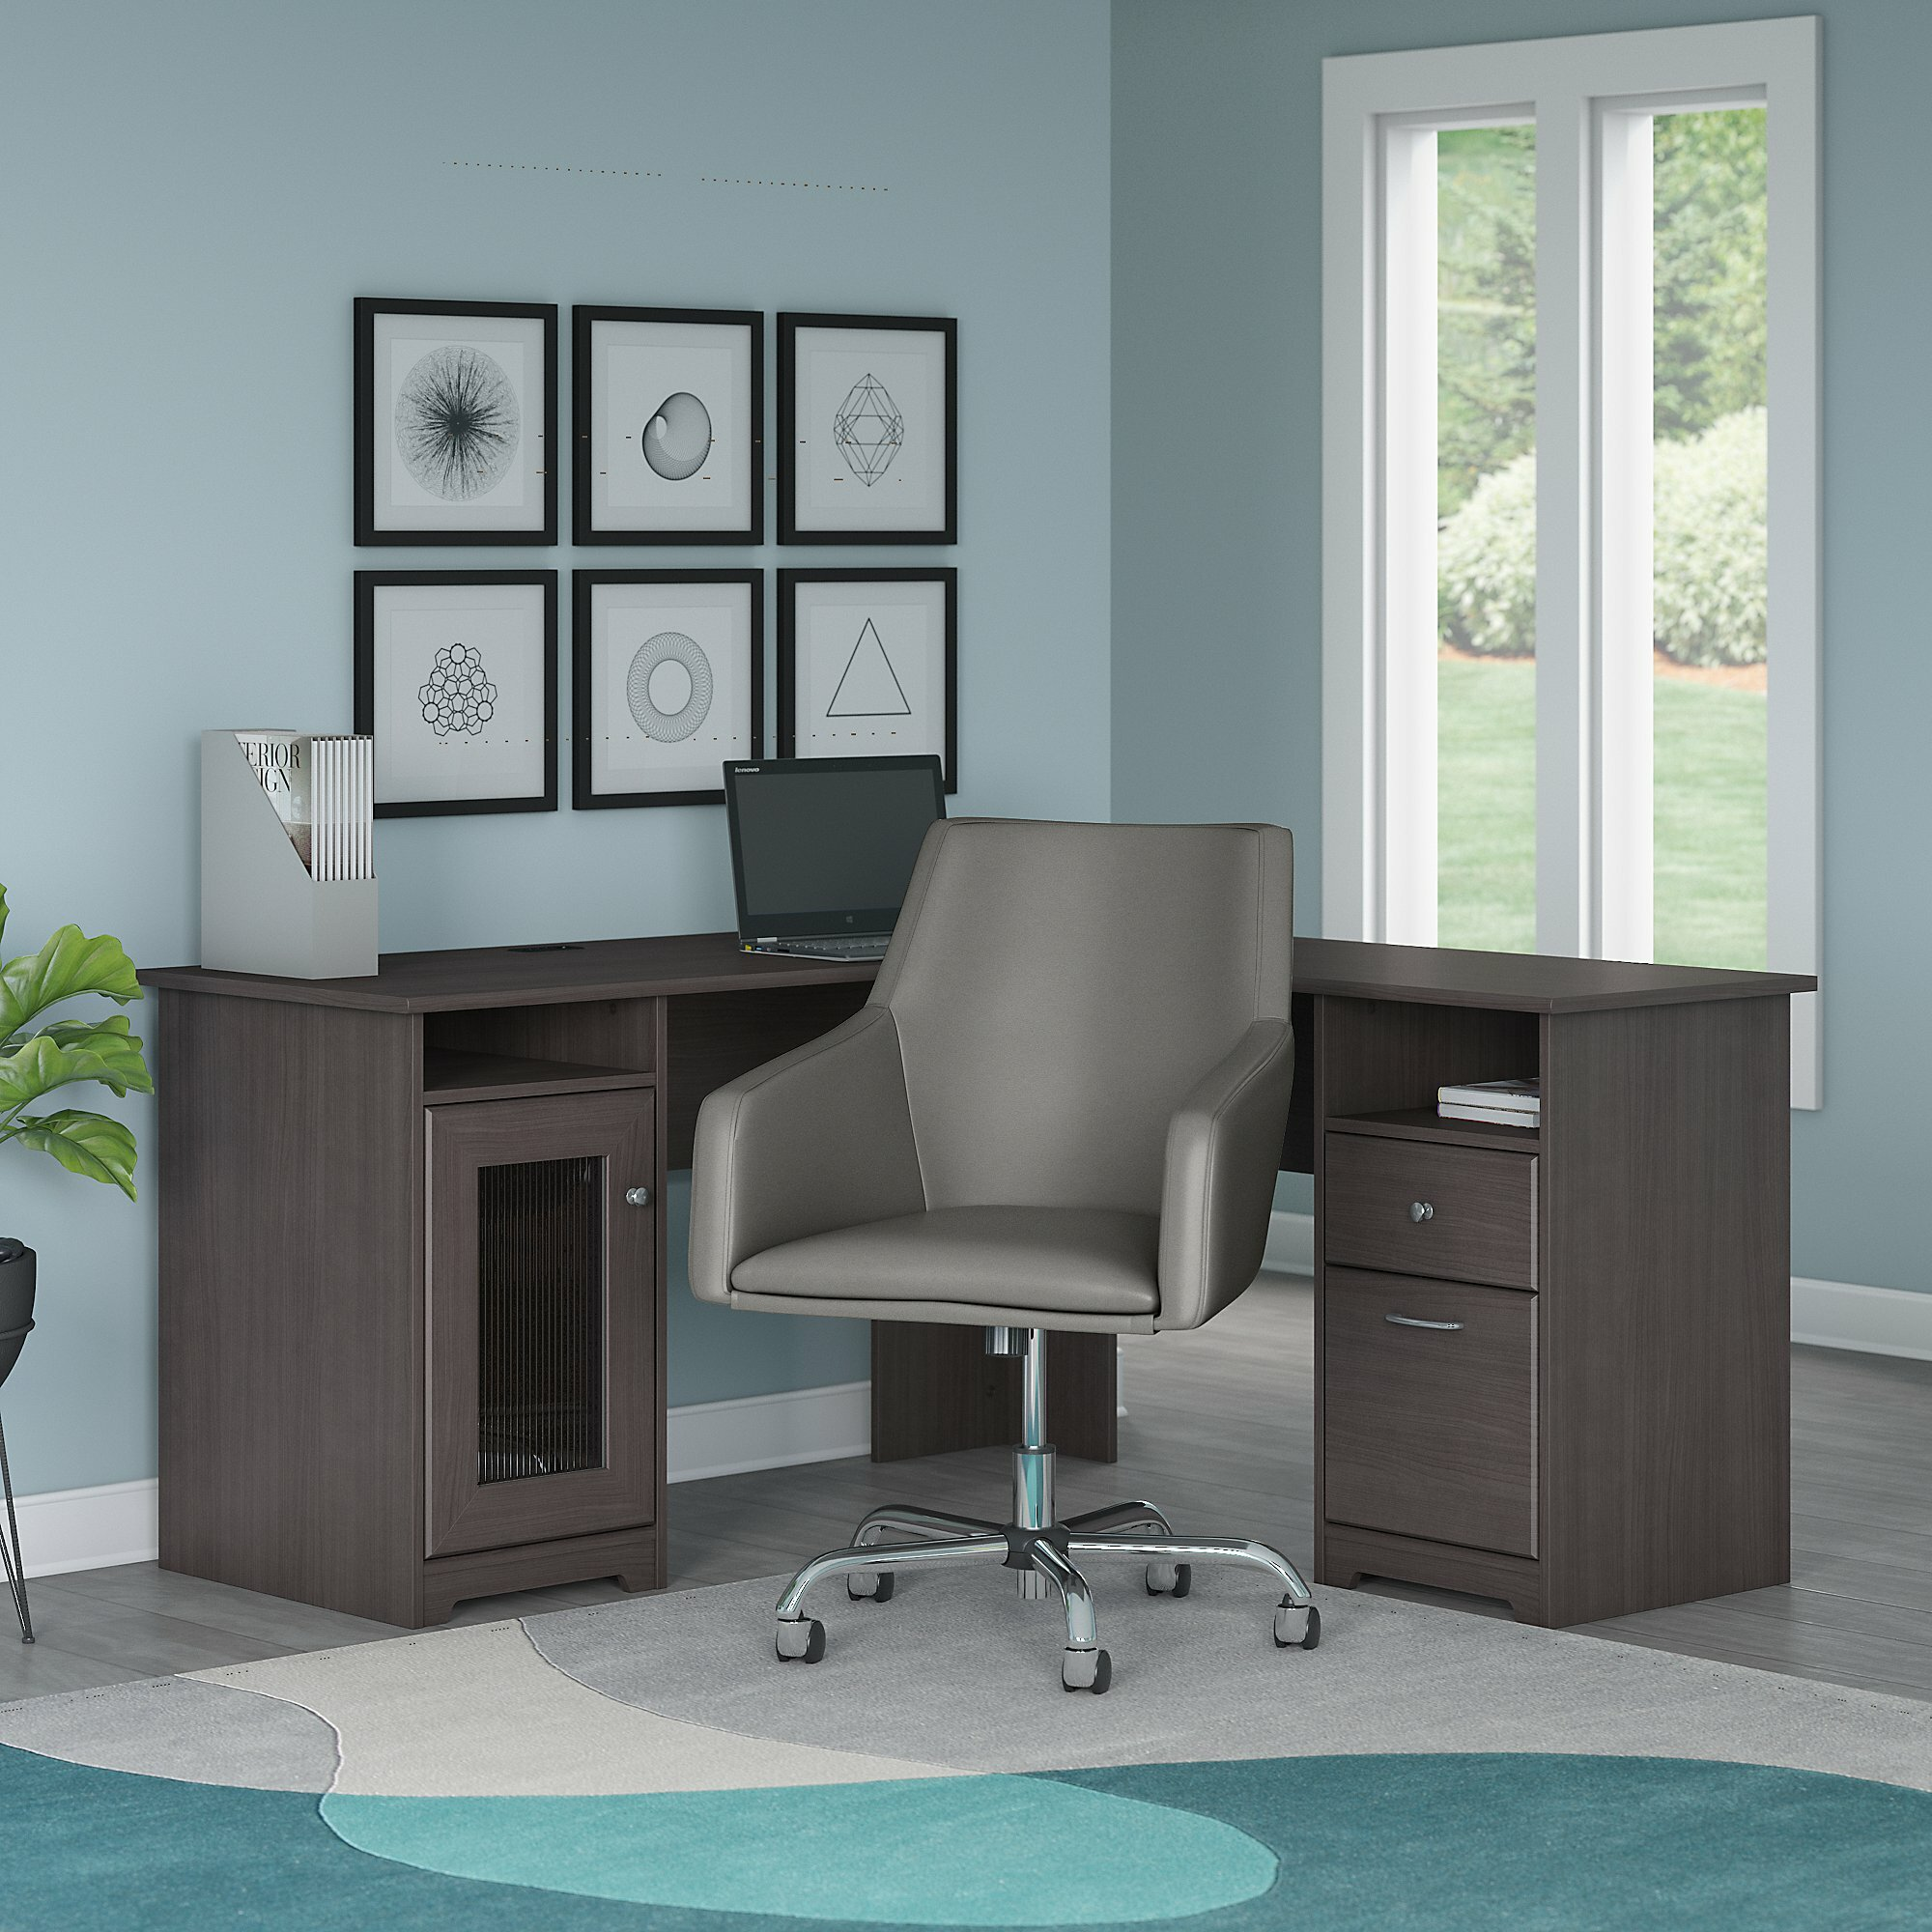 Red Barrel Studio Hillsdale L Shape Computer Desk And Chair Set Reviews Wayfair